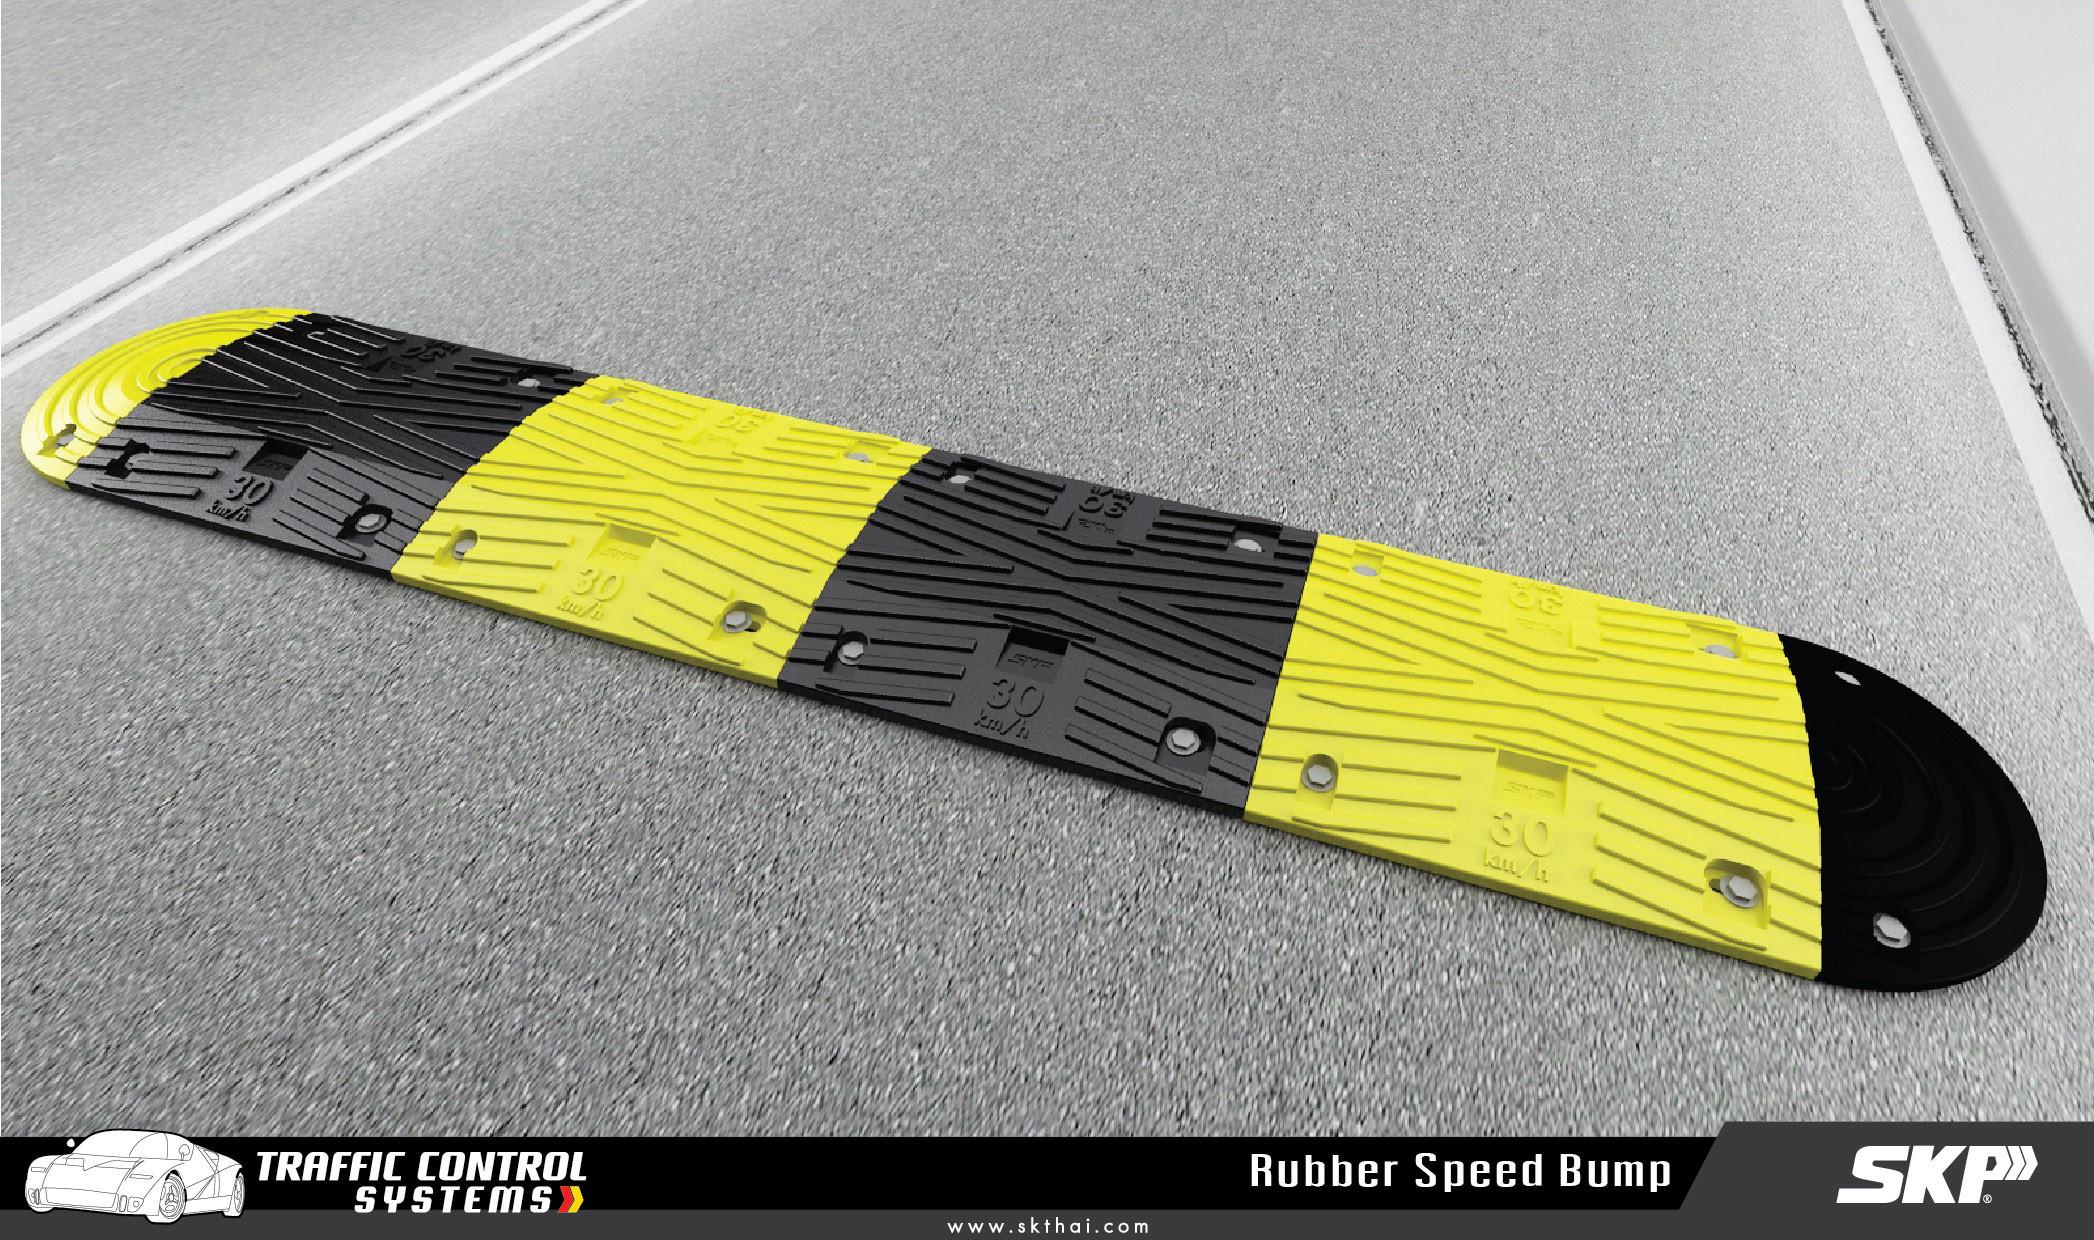 Rubber Speed Bump